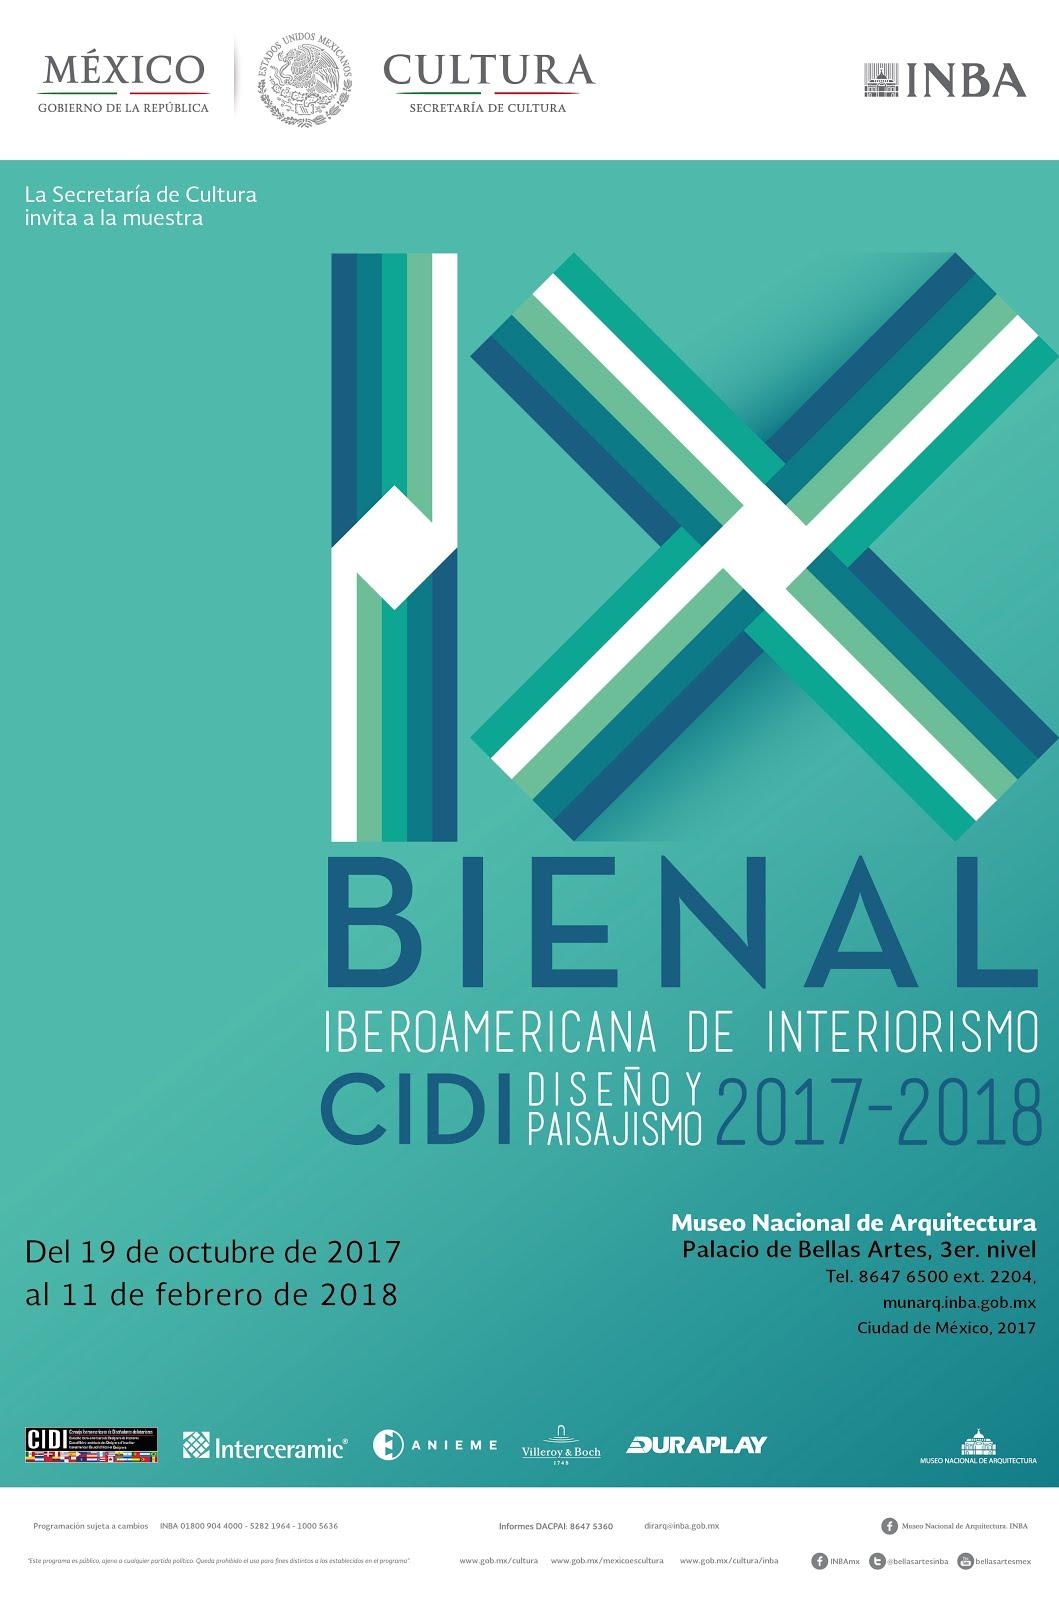 IX Bienal Iberoamericana CIDI Interiorismo, Diseño & Paisajismo 2017-2018